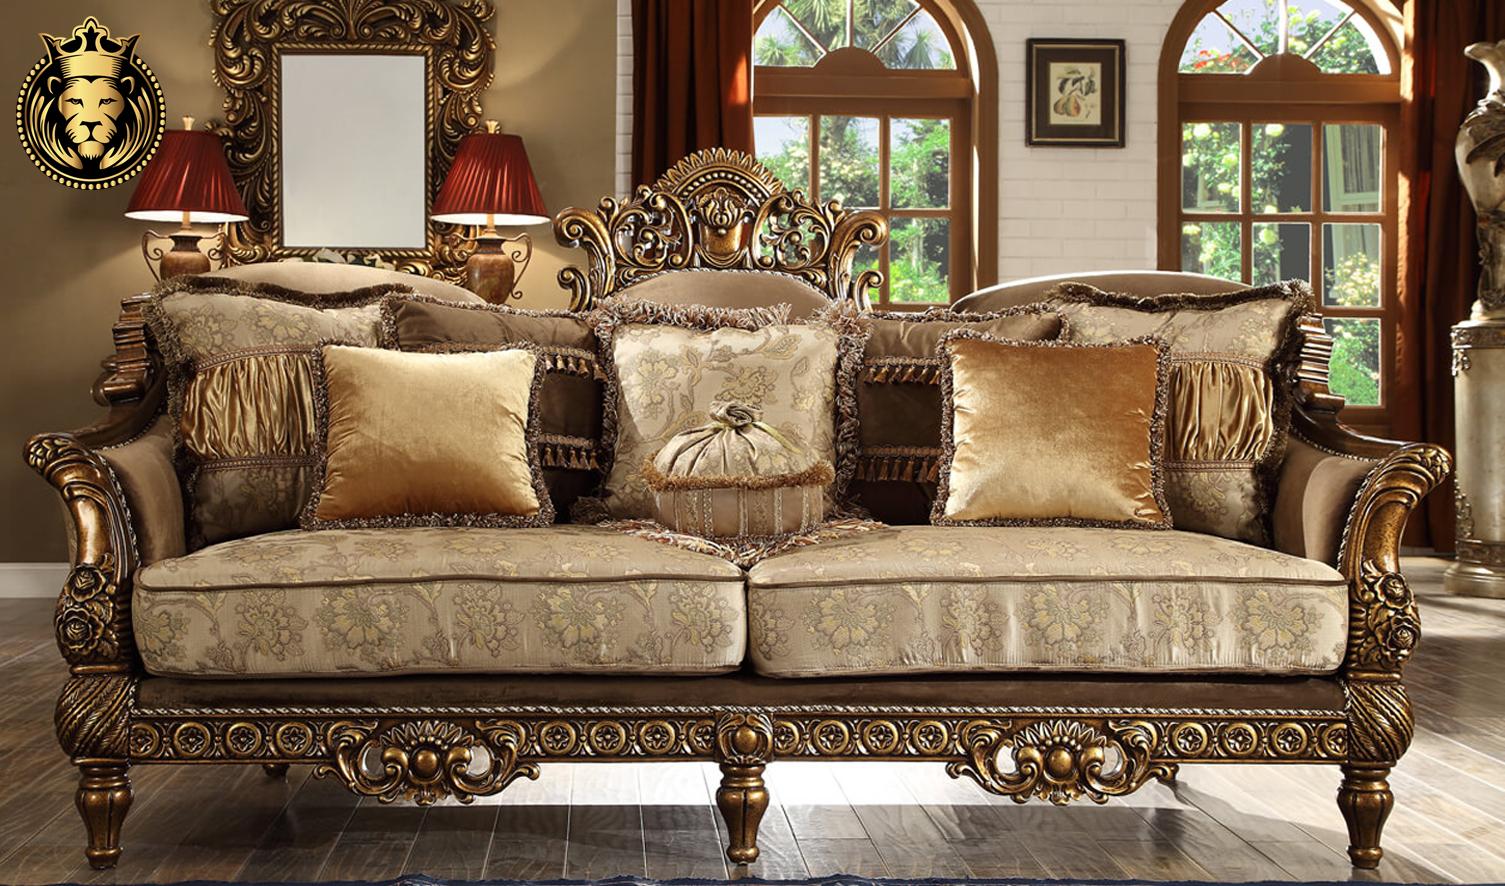 Detroit European Style High Carving Sofa Set